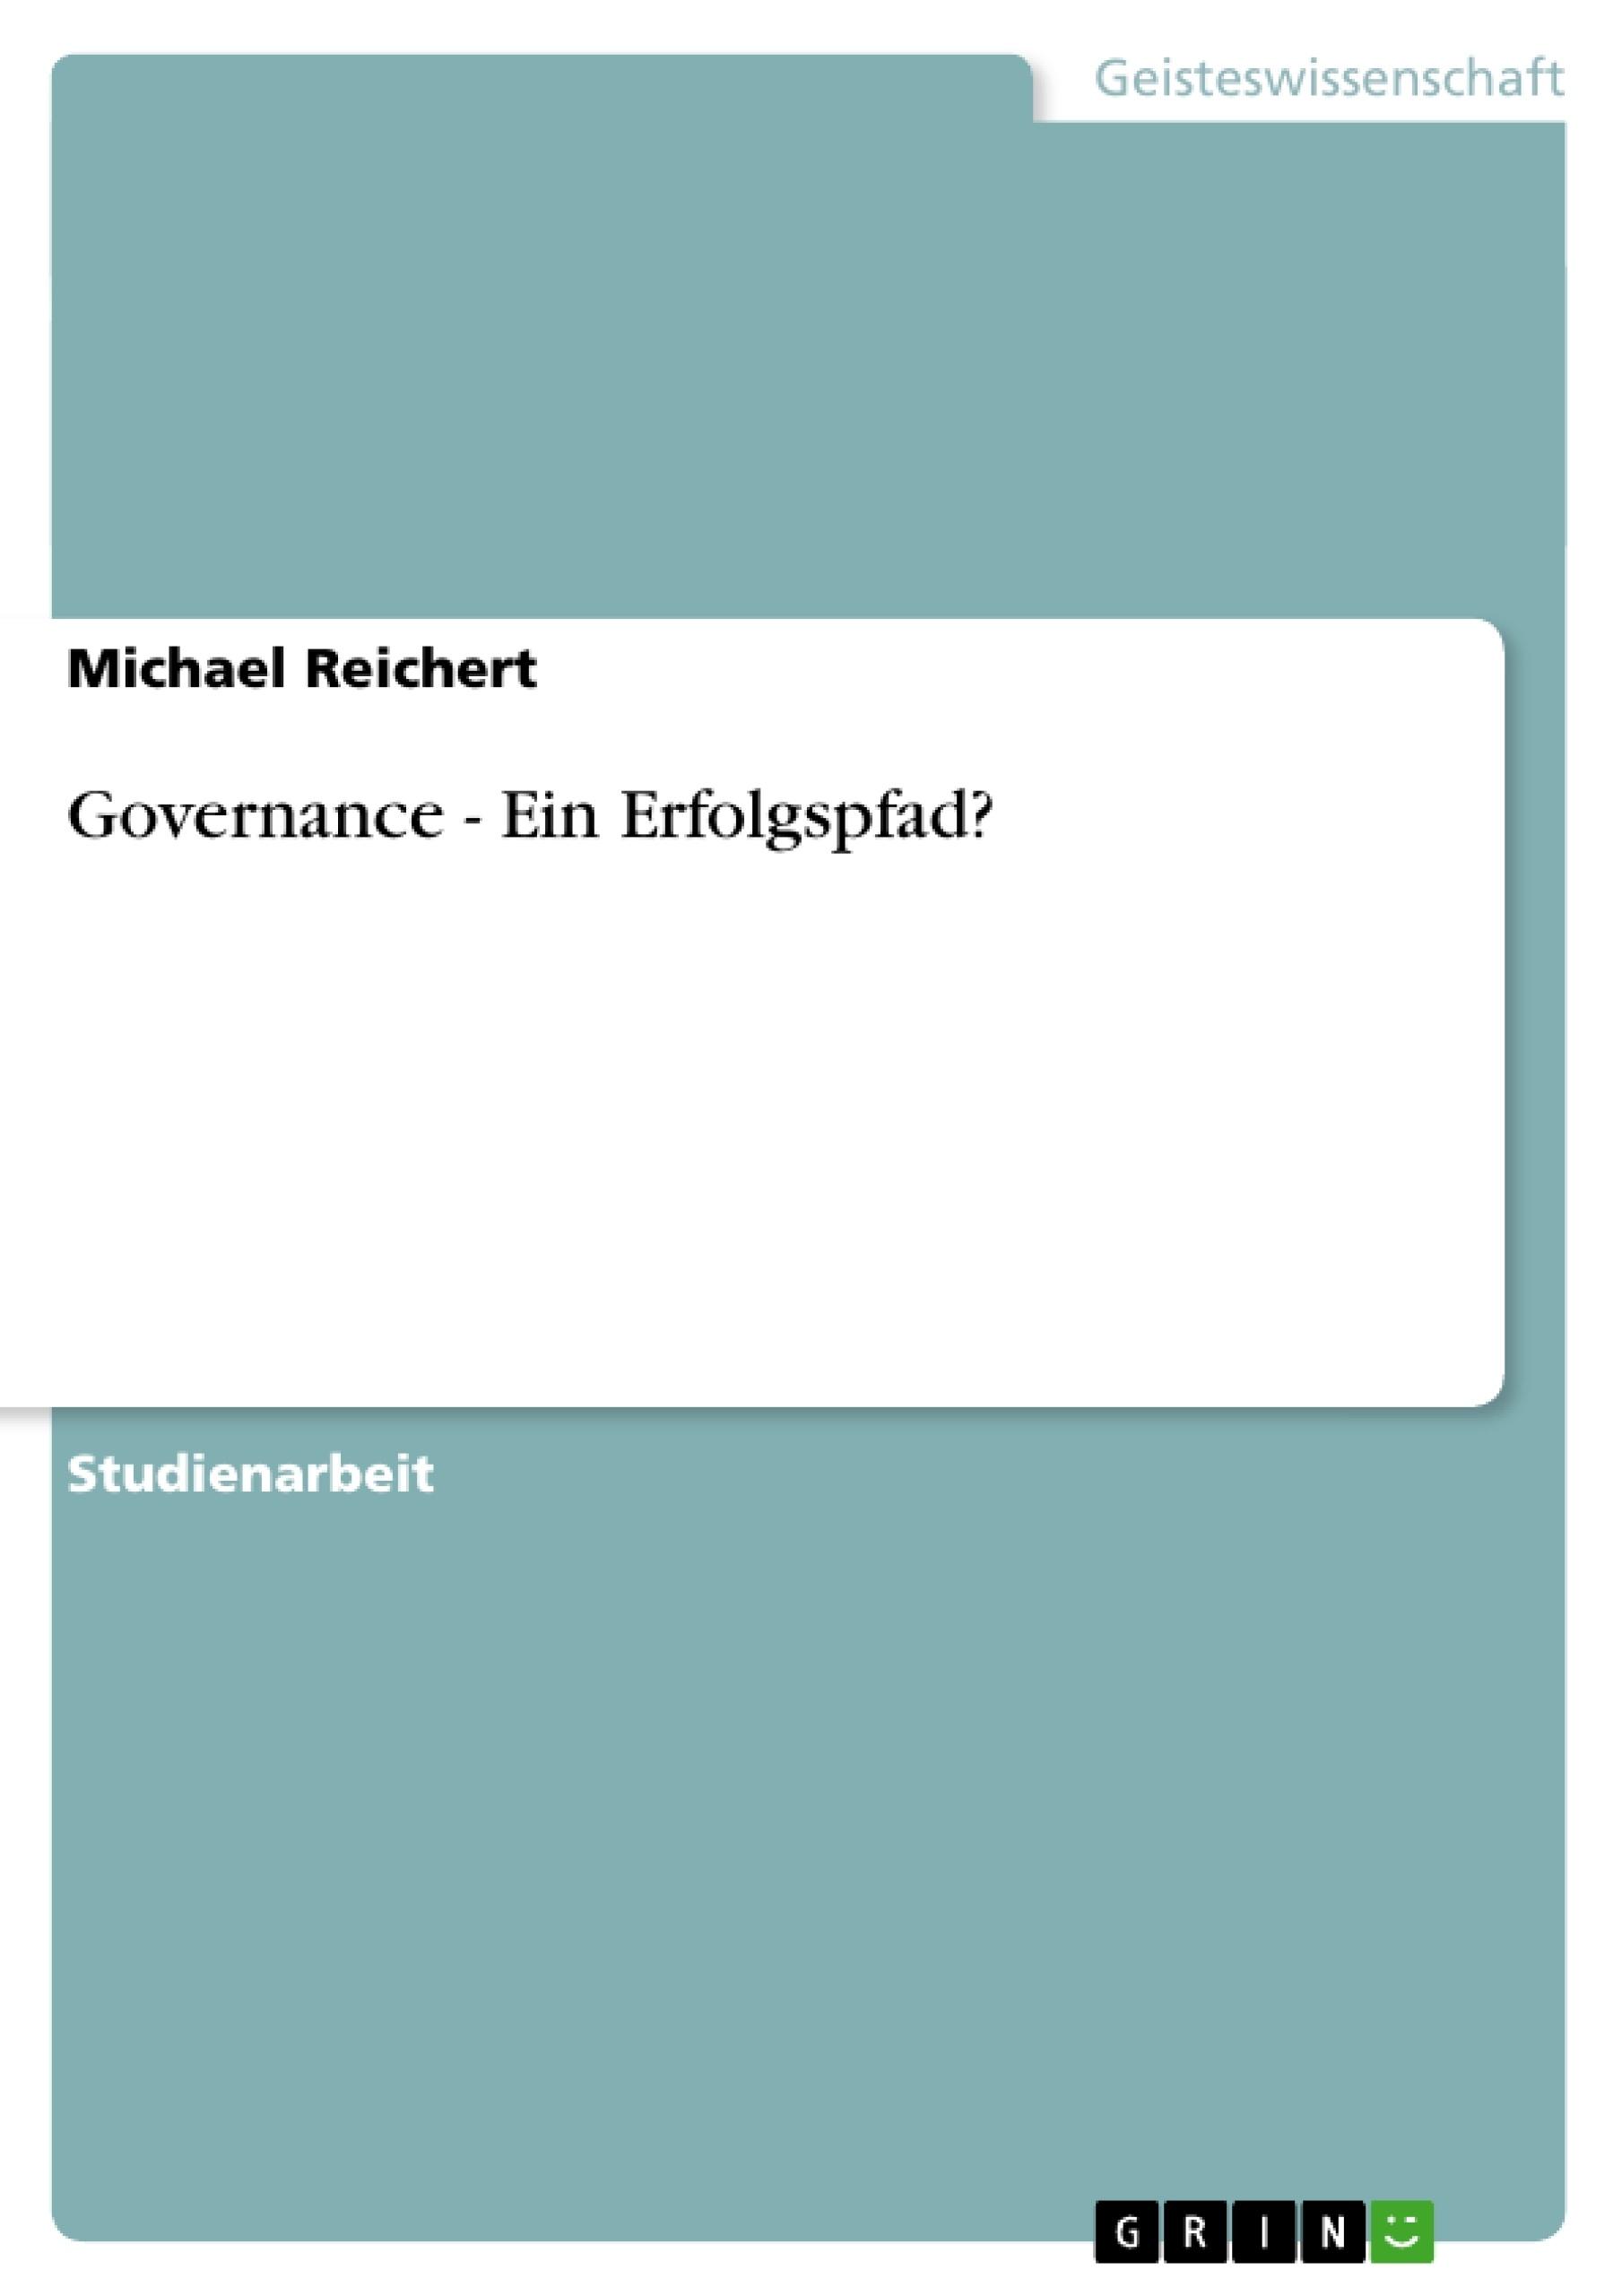 Titel: Governance - Ein Erfolgspfad?